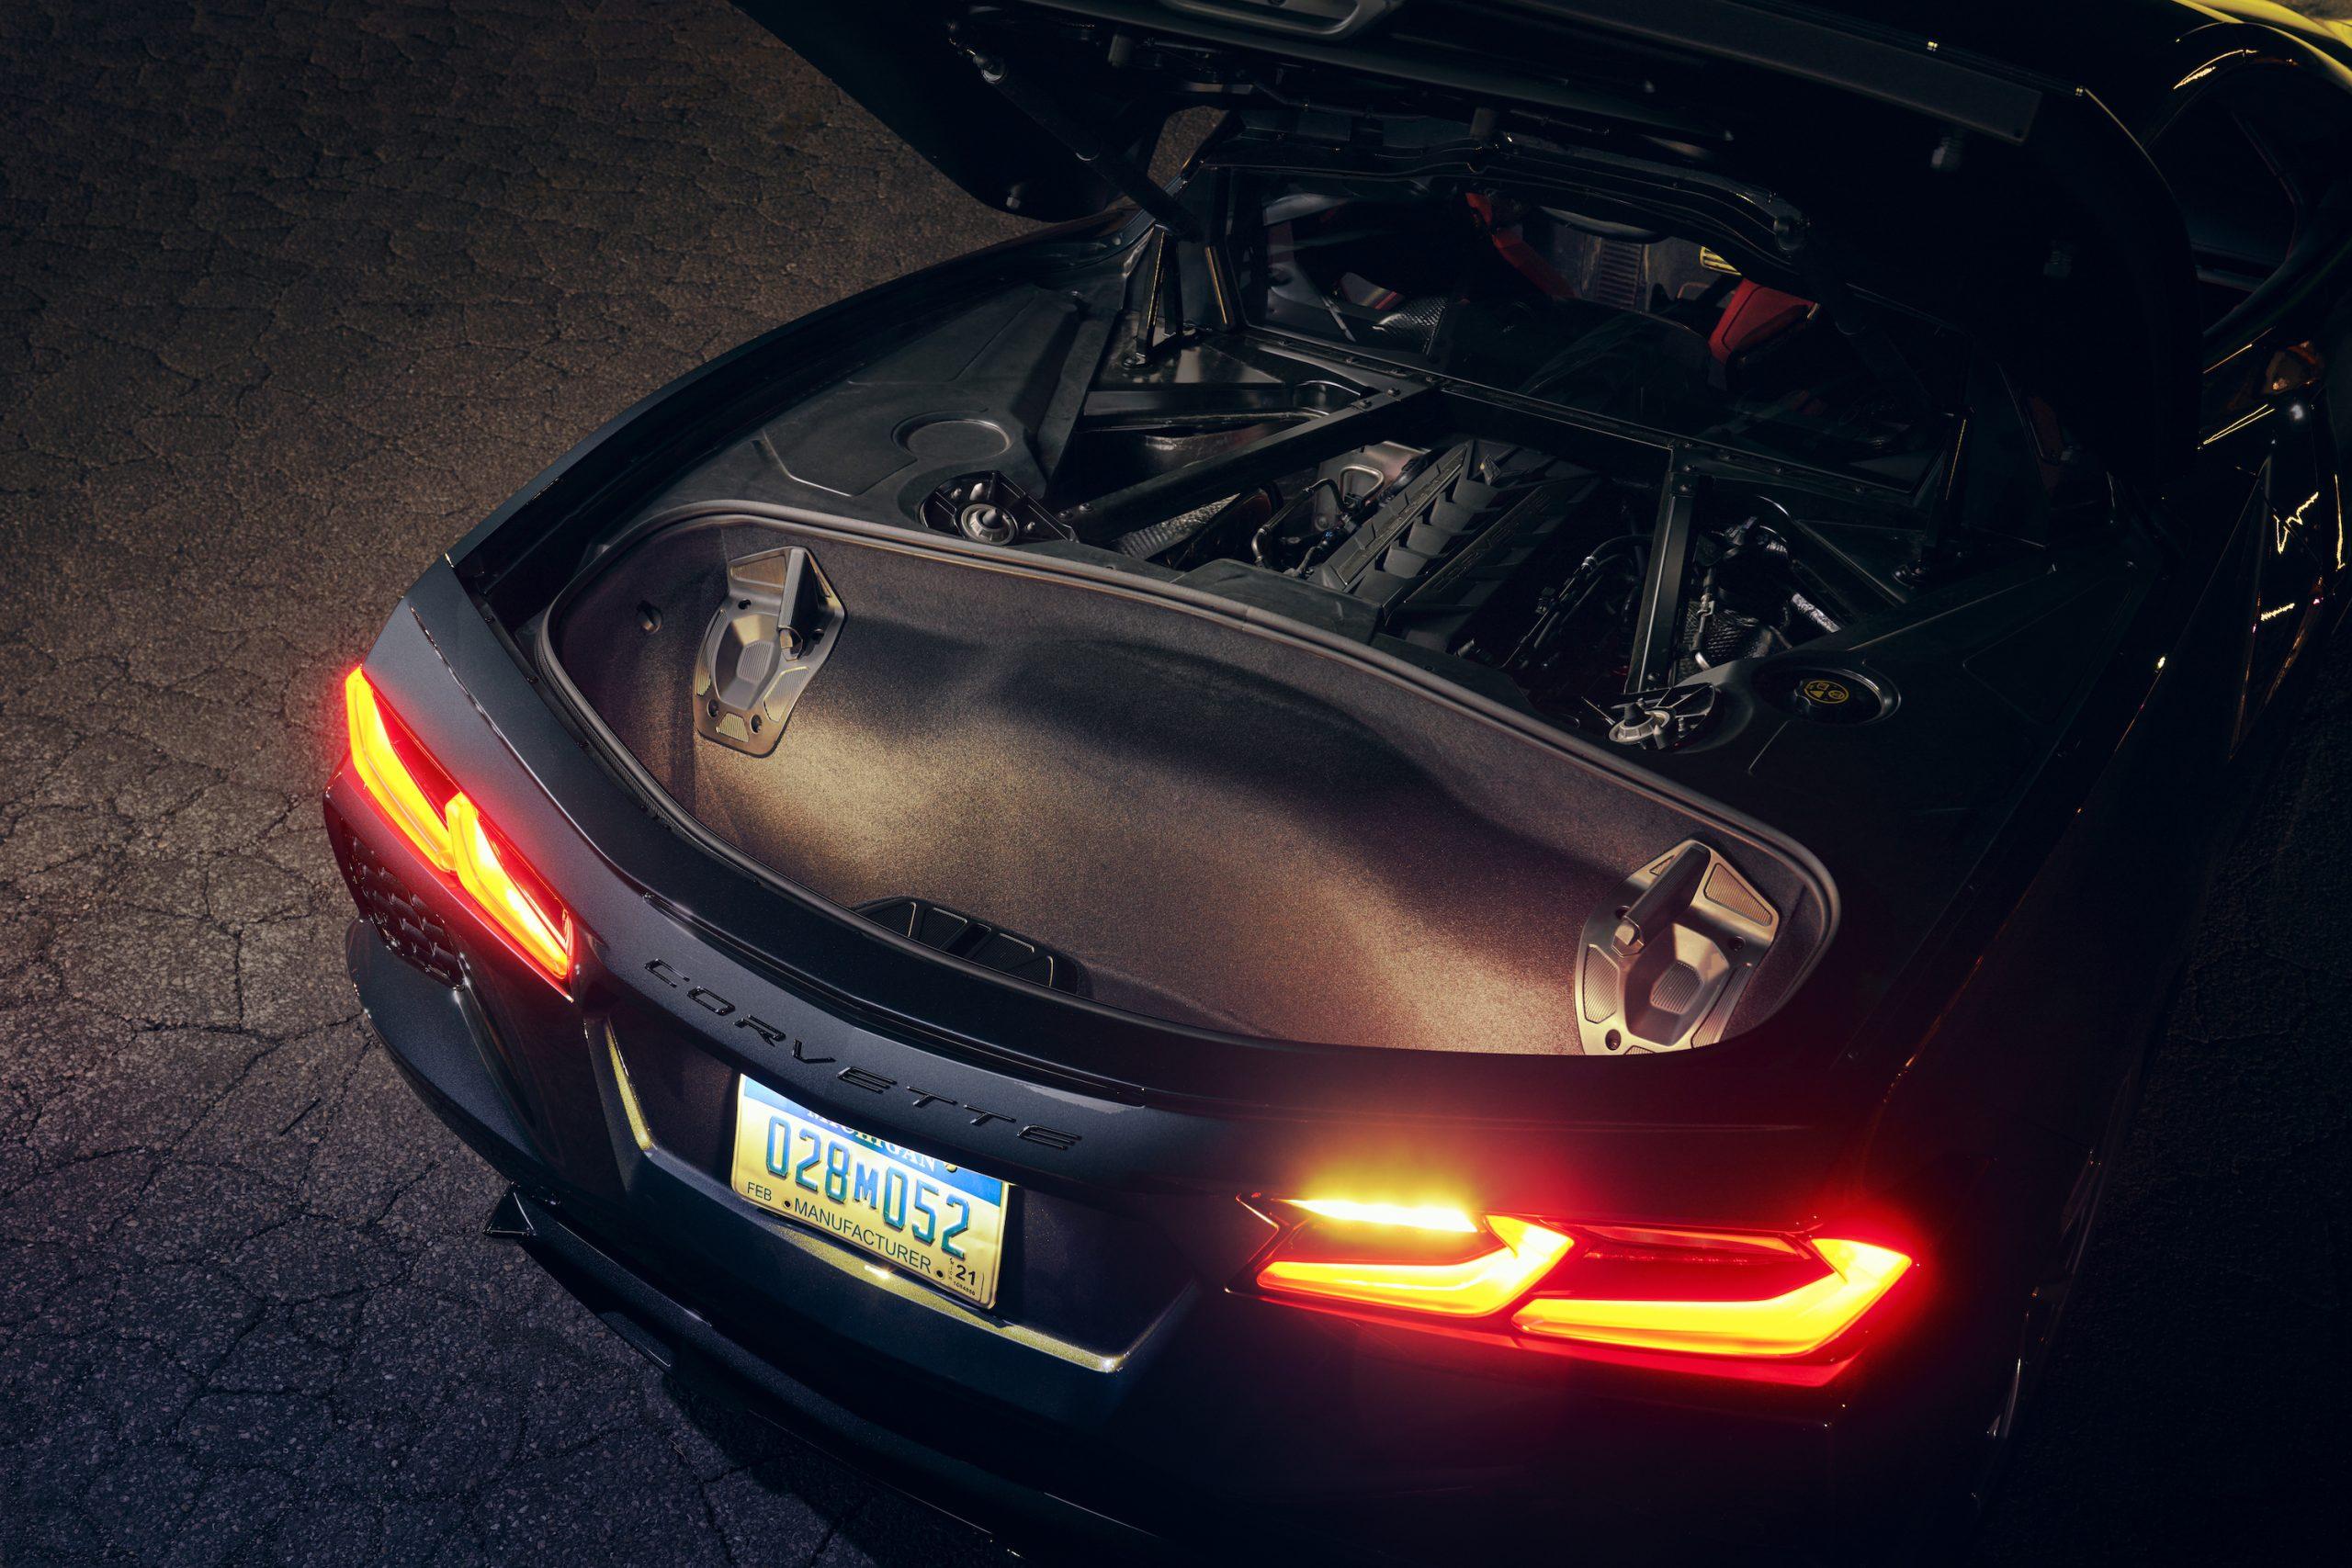 2020 Chevrolet Corvette Stingray 2LT C8 Rear Open Hatch And Trunk